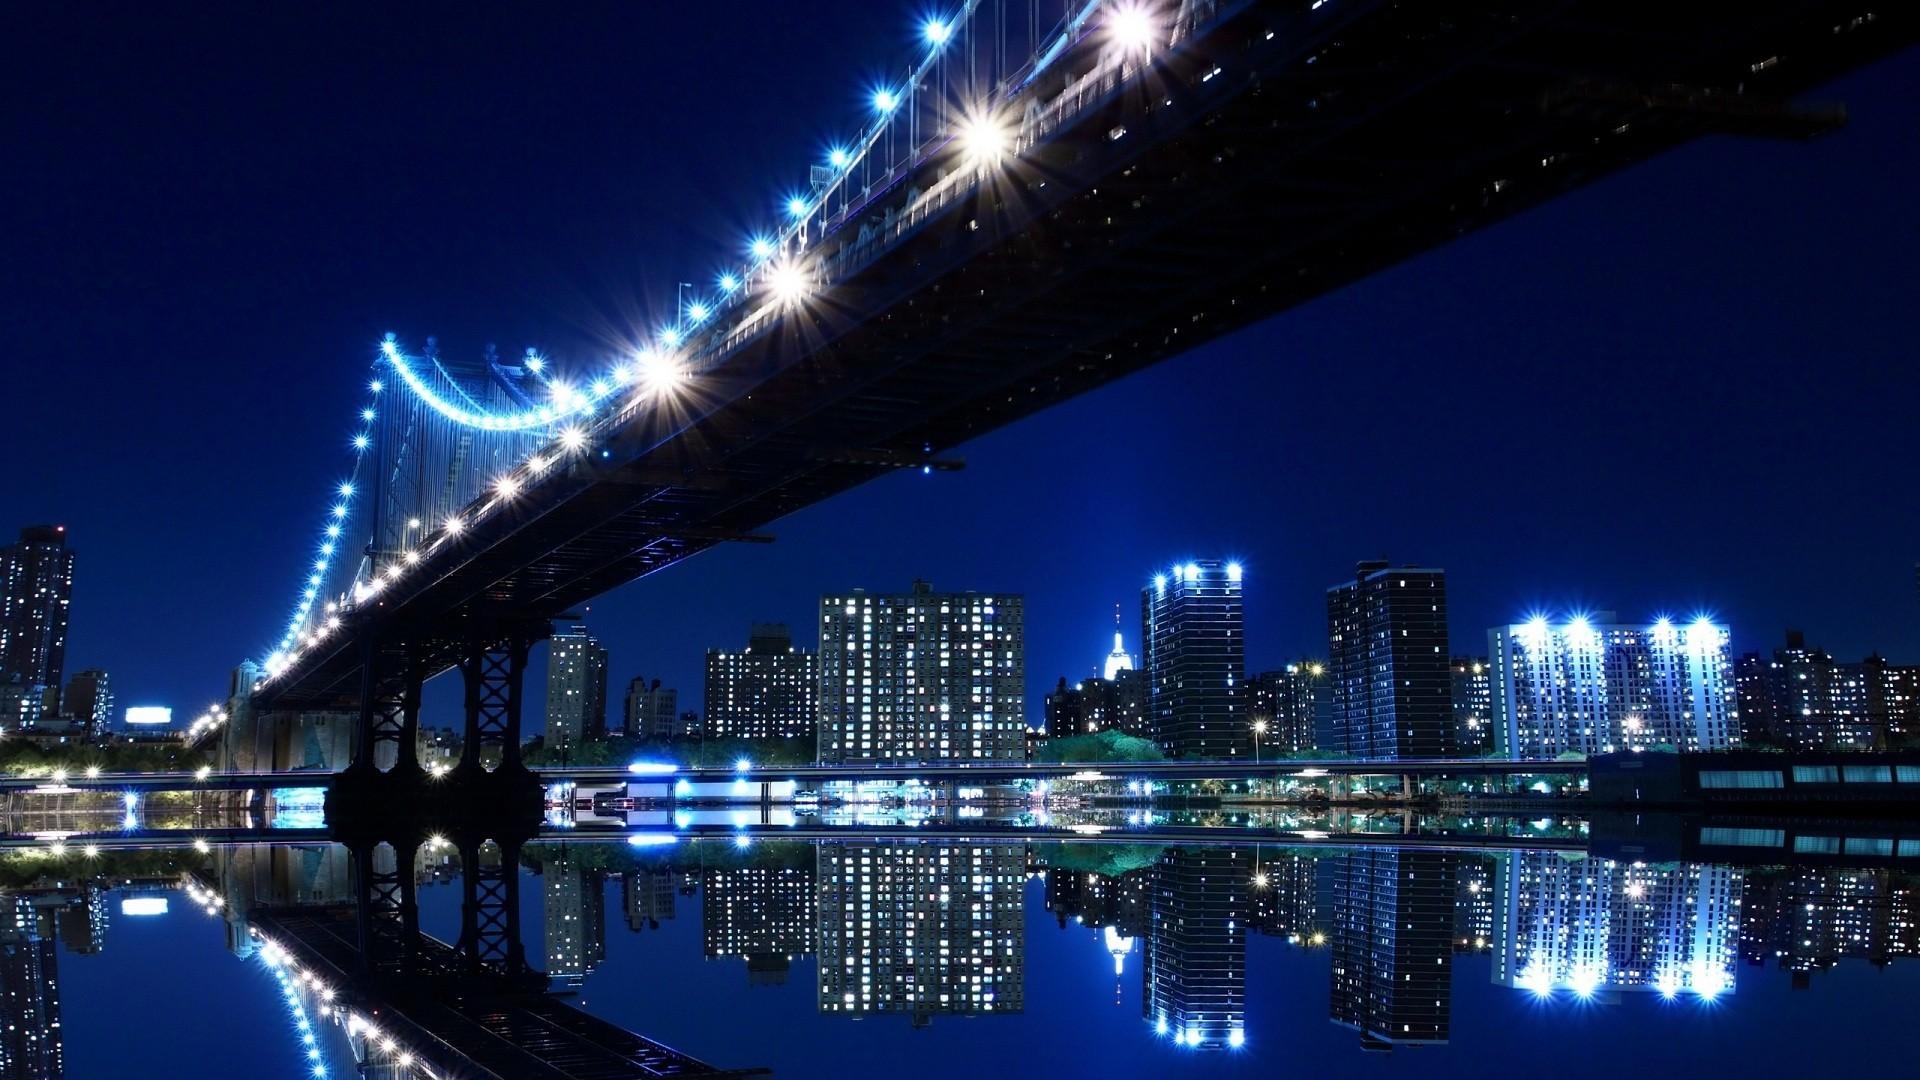 Late Night City Bridge View HD Wallpaper. « »